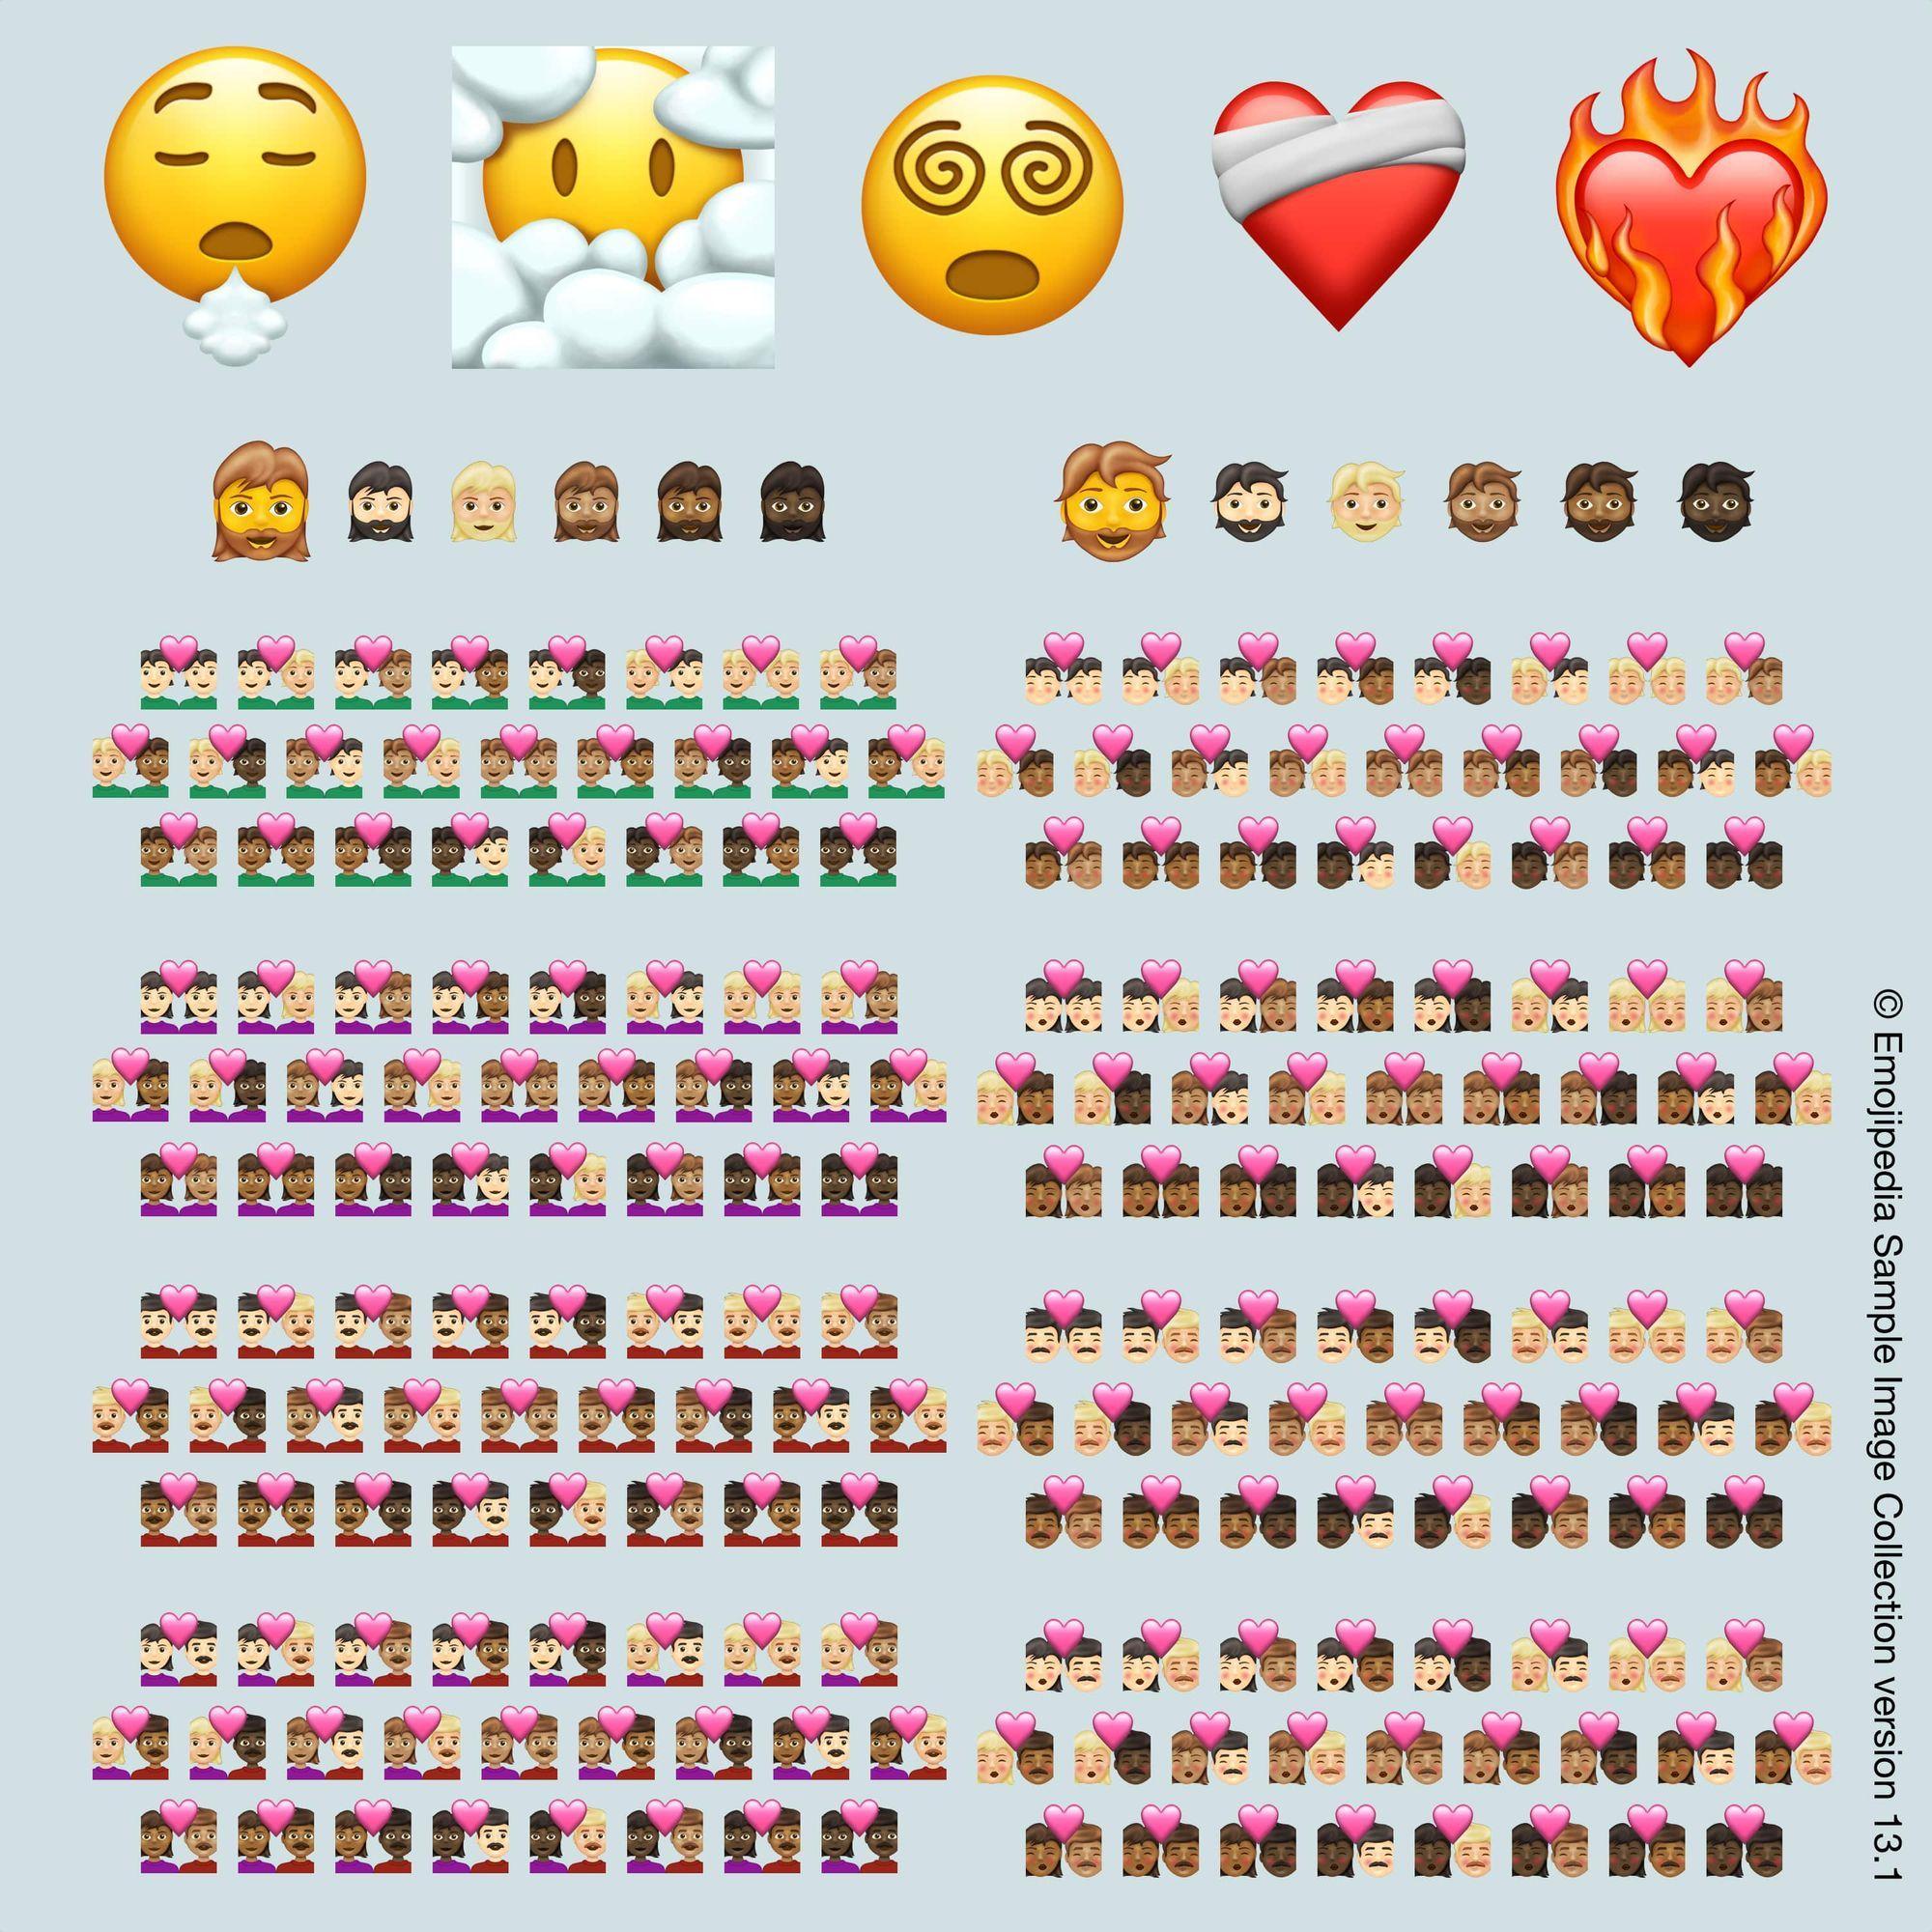 emojipedia-version-13-1 les emojis pour -2021